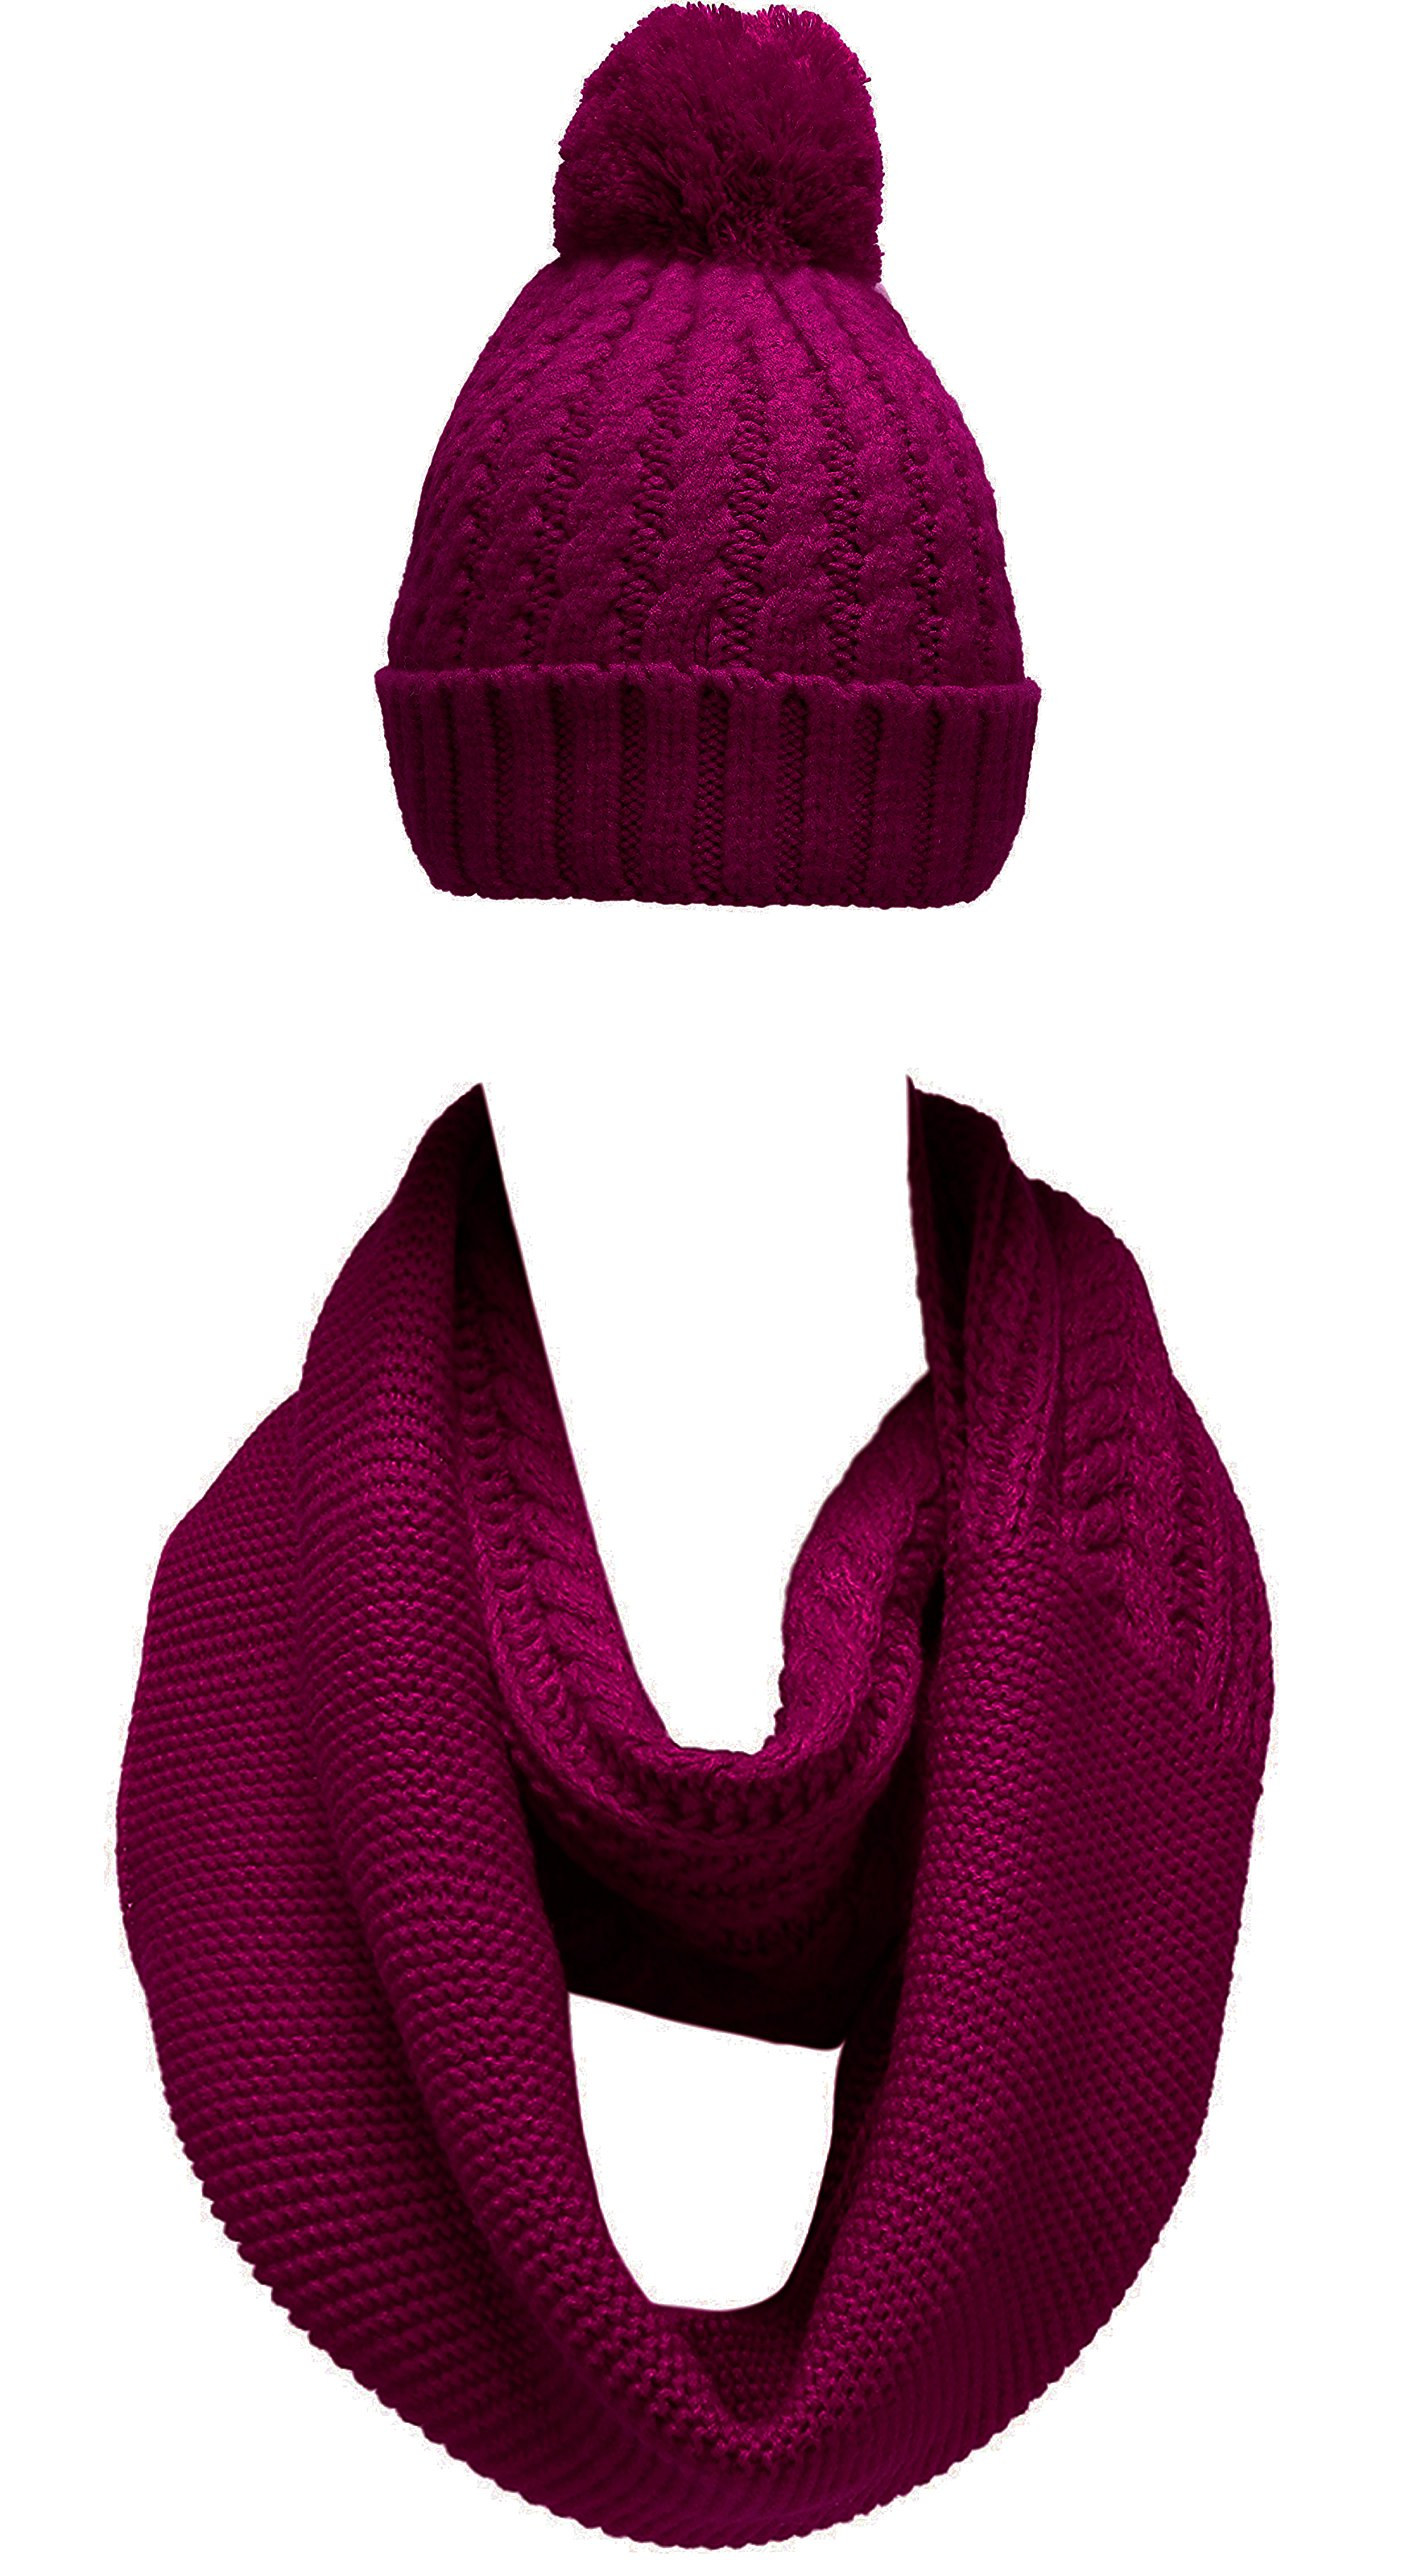 NEOSAN Women Winter Thick Knit Infinity Loop Scarf And Pom Pom Hat Set Crochet Plum